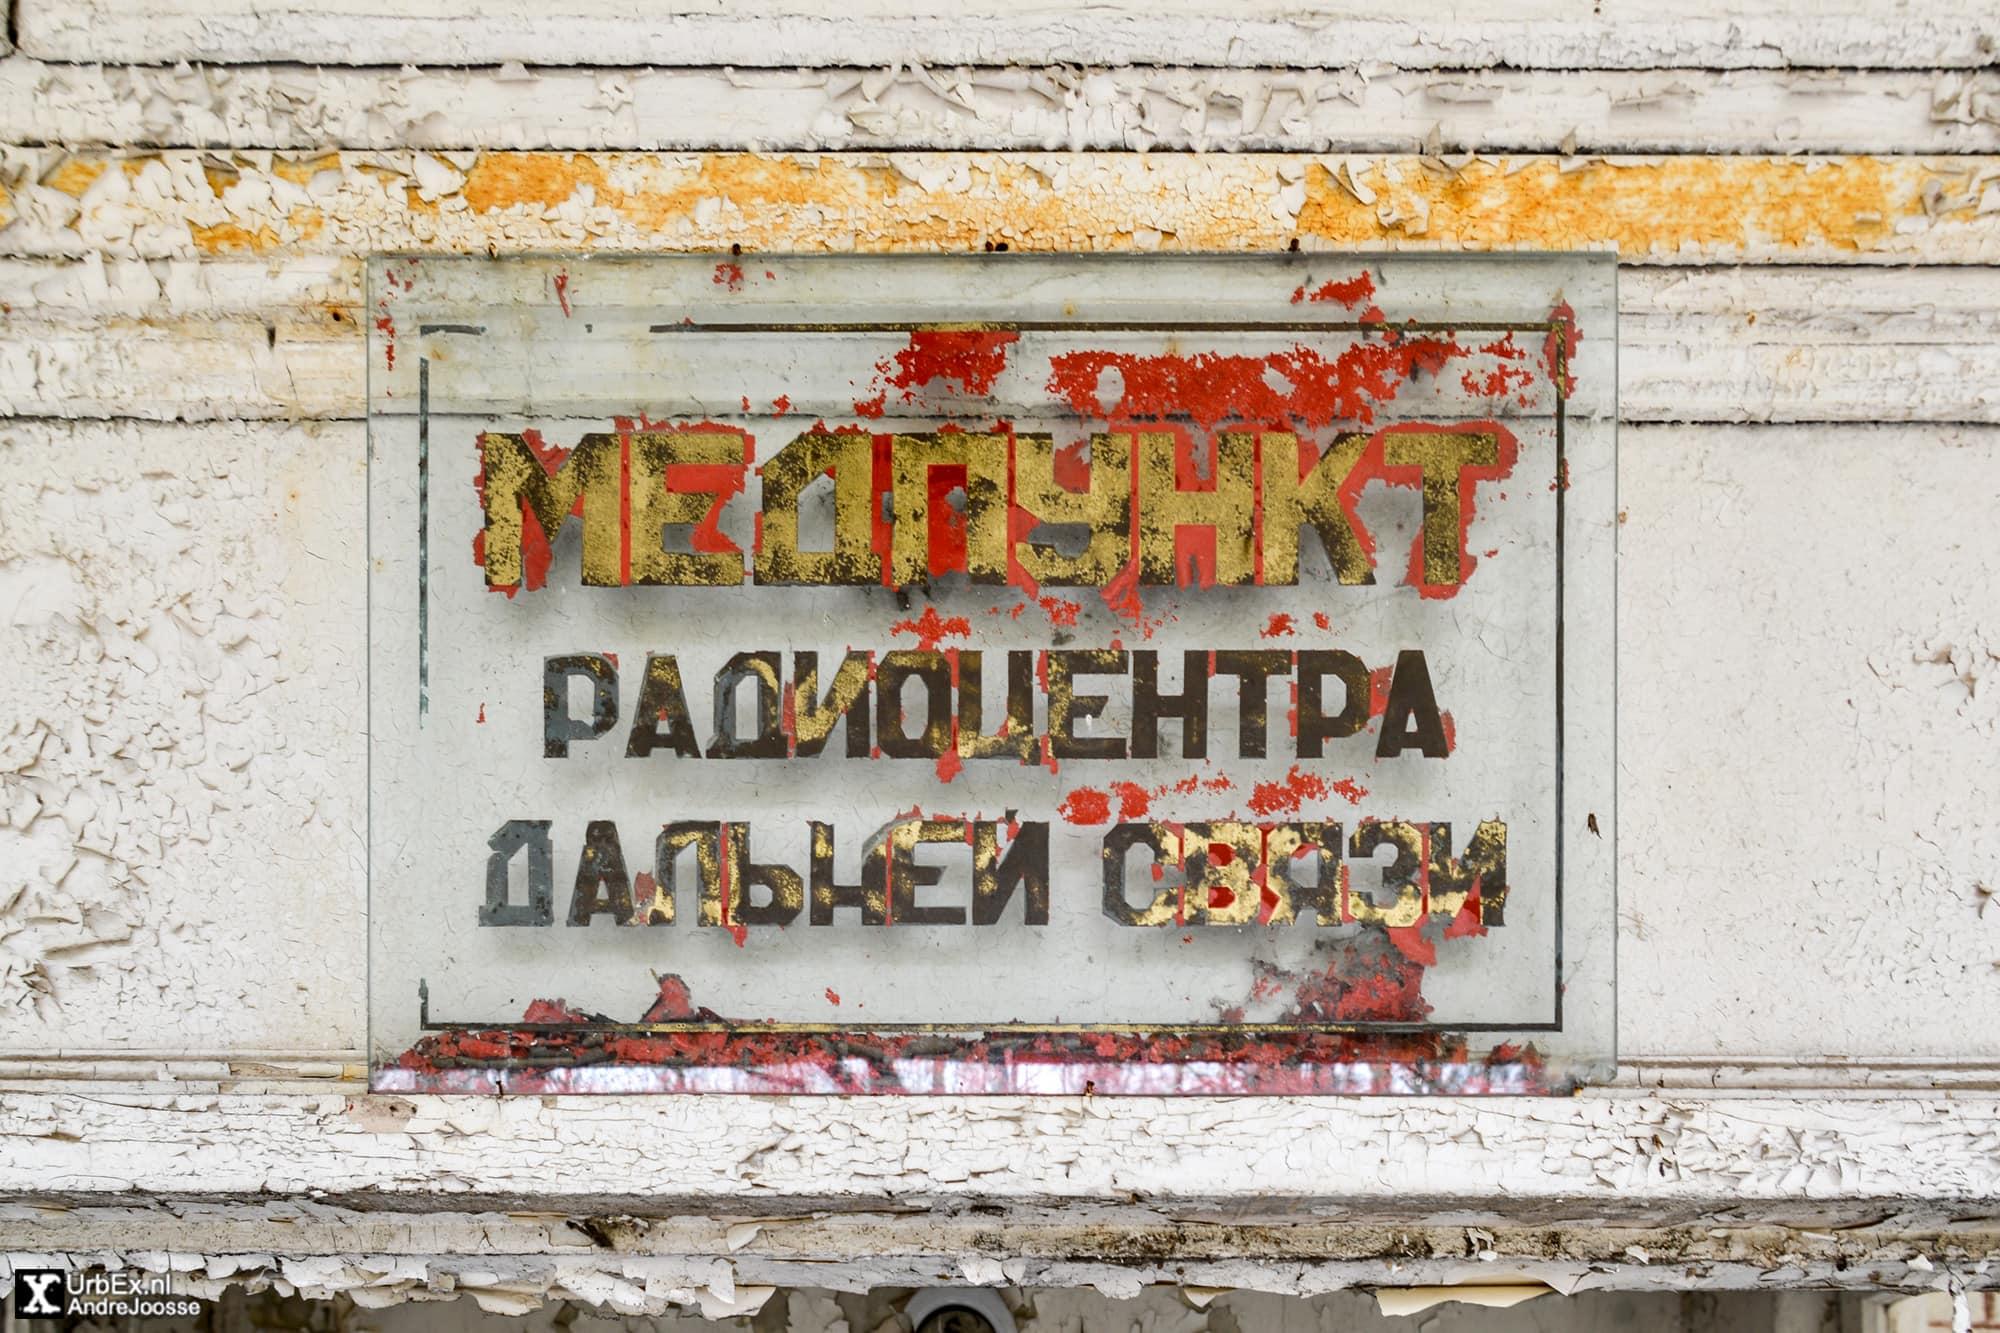 Emergency entrance